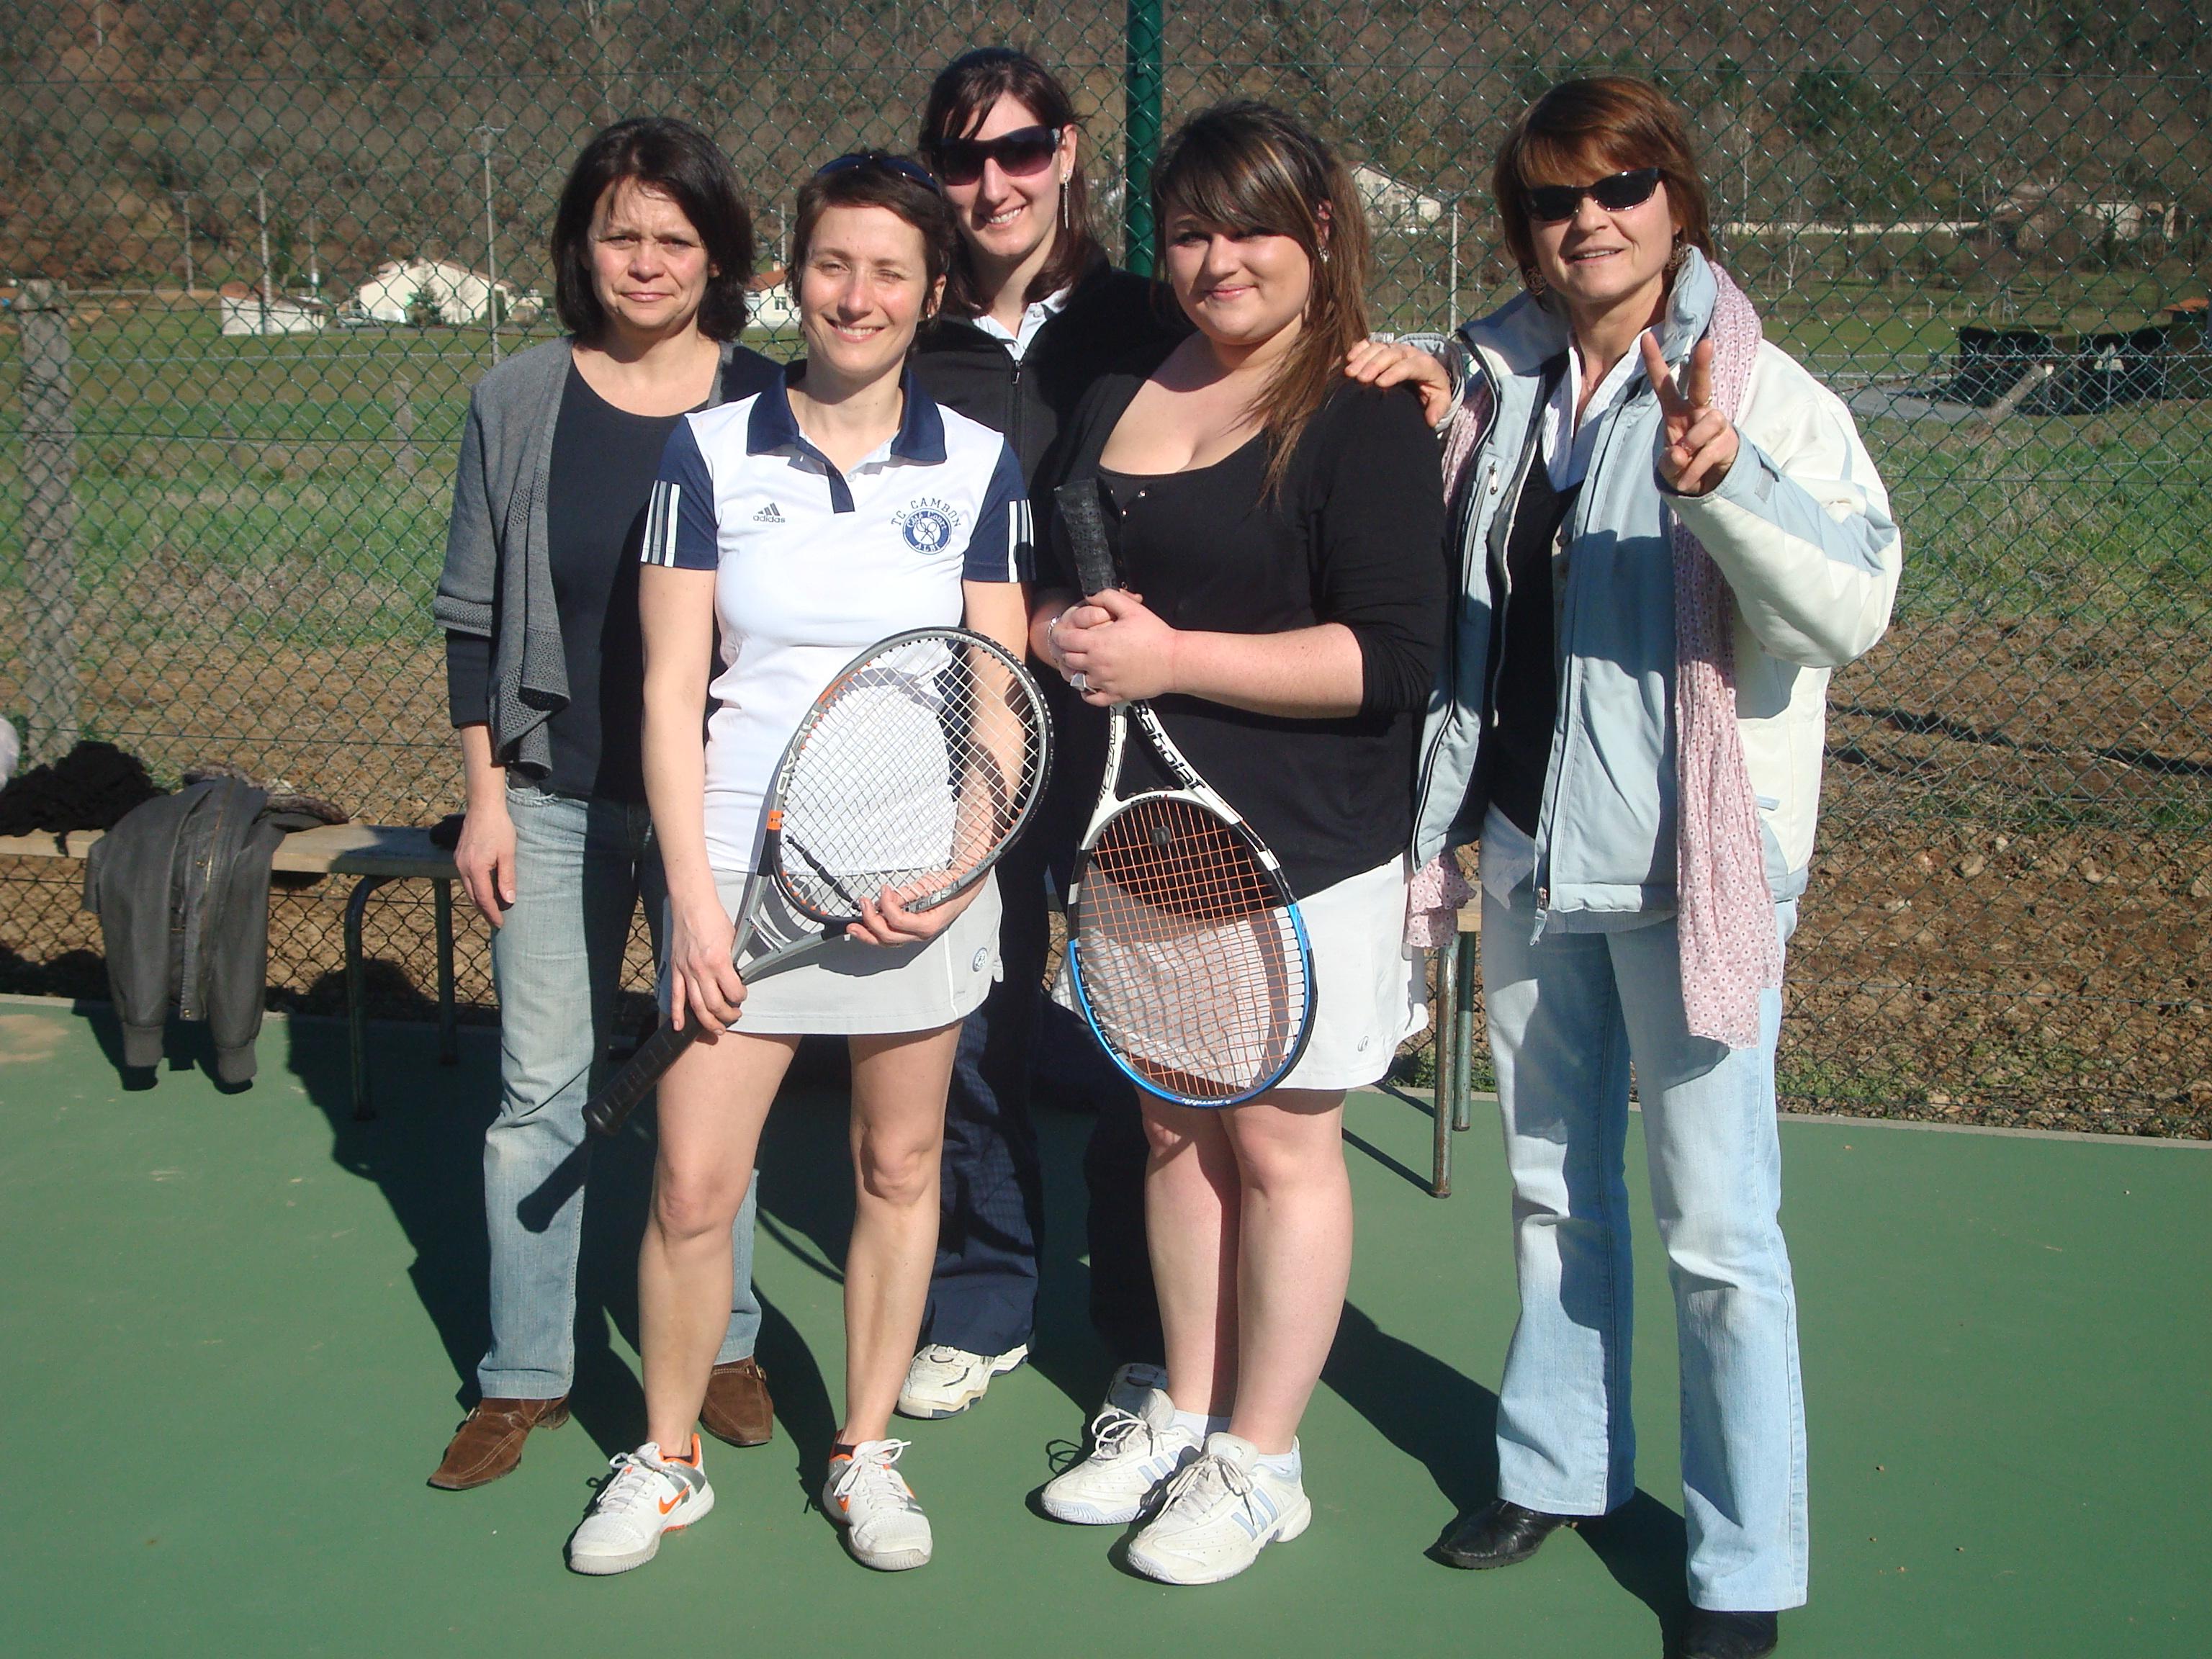 Rencontre tennis